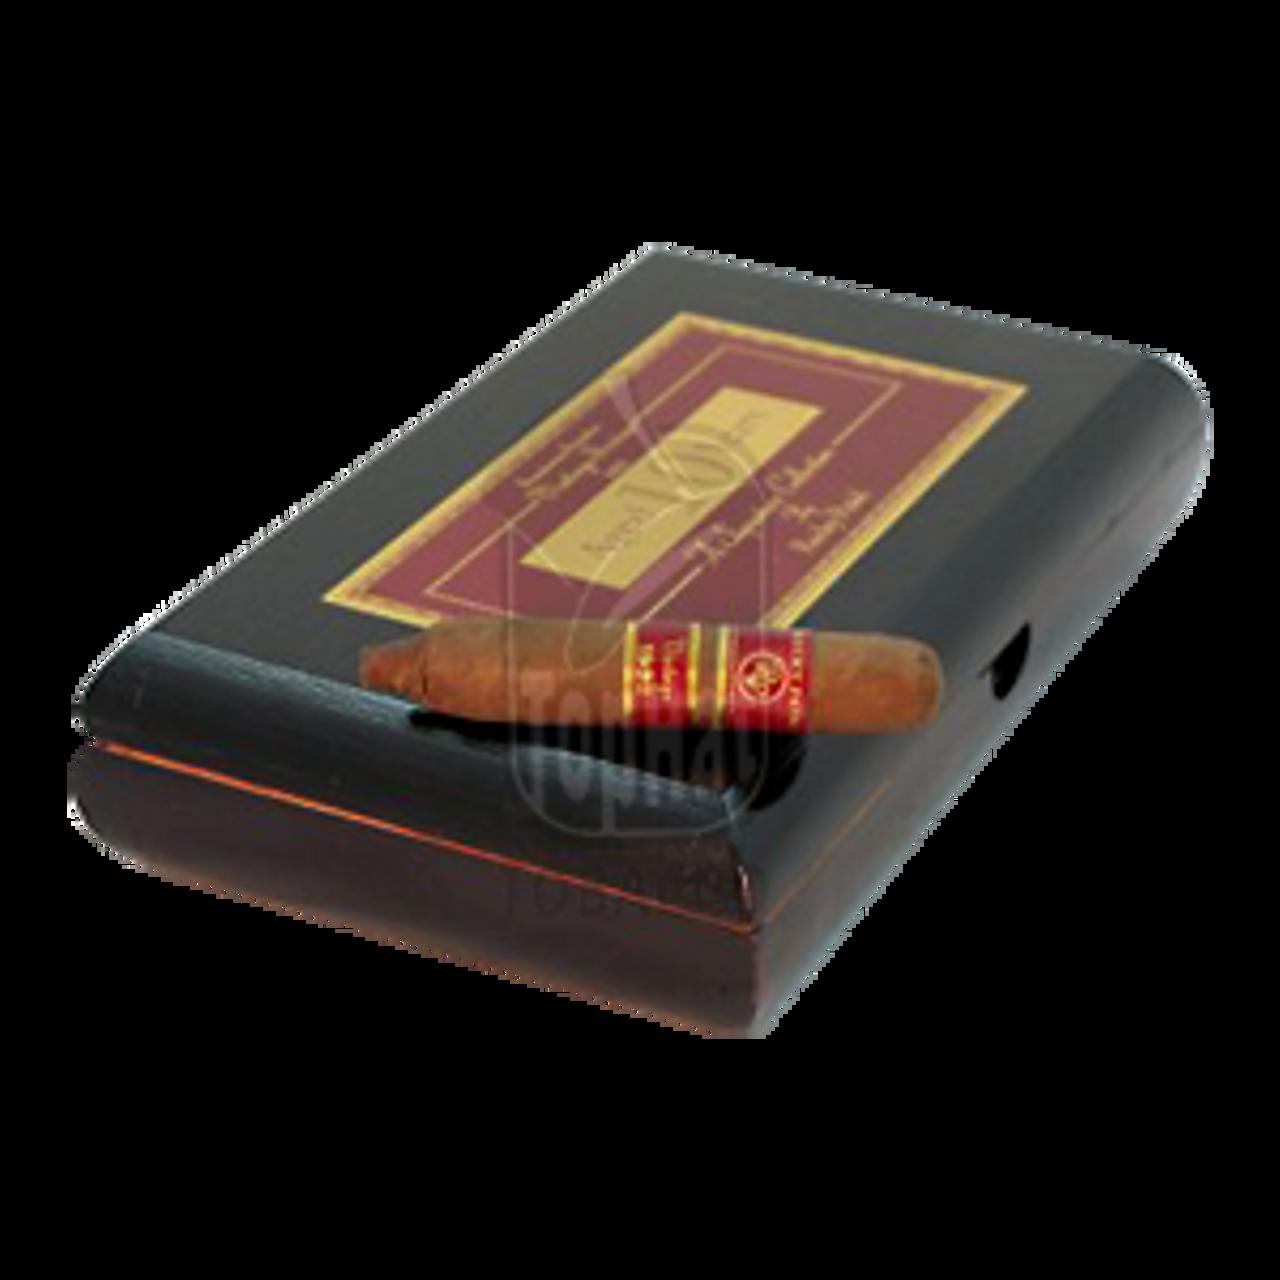 Rocky Patel Vintage 1992 Perfecto Cigars - 4 x 48 (Box of 20)